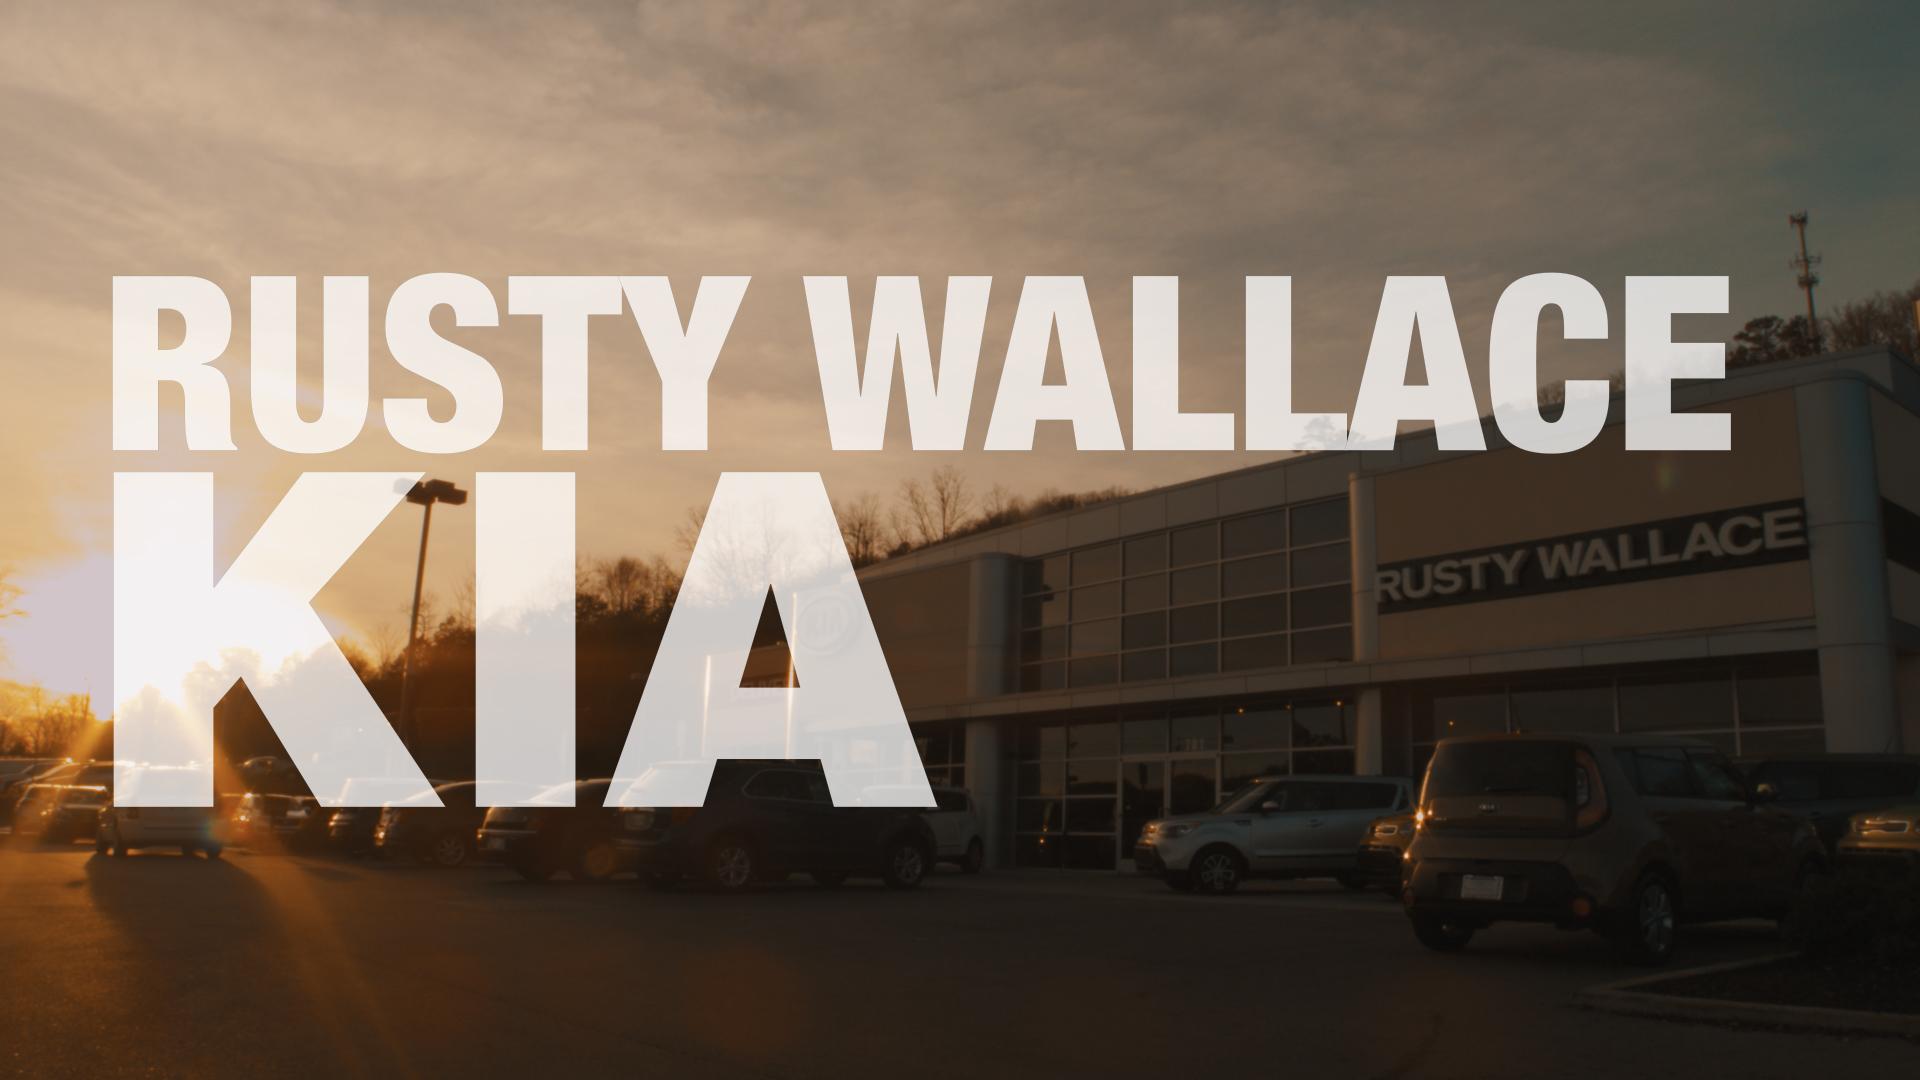 Rusty Wallace Kia